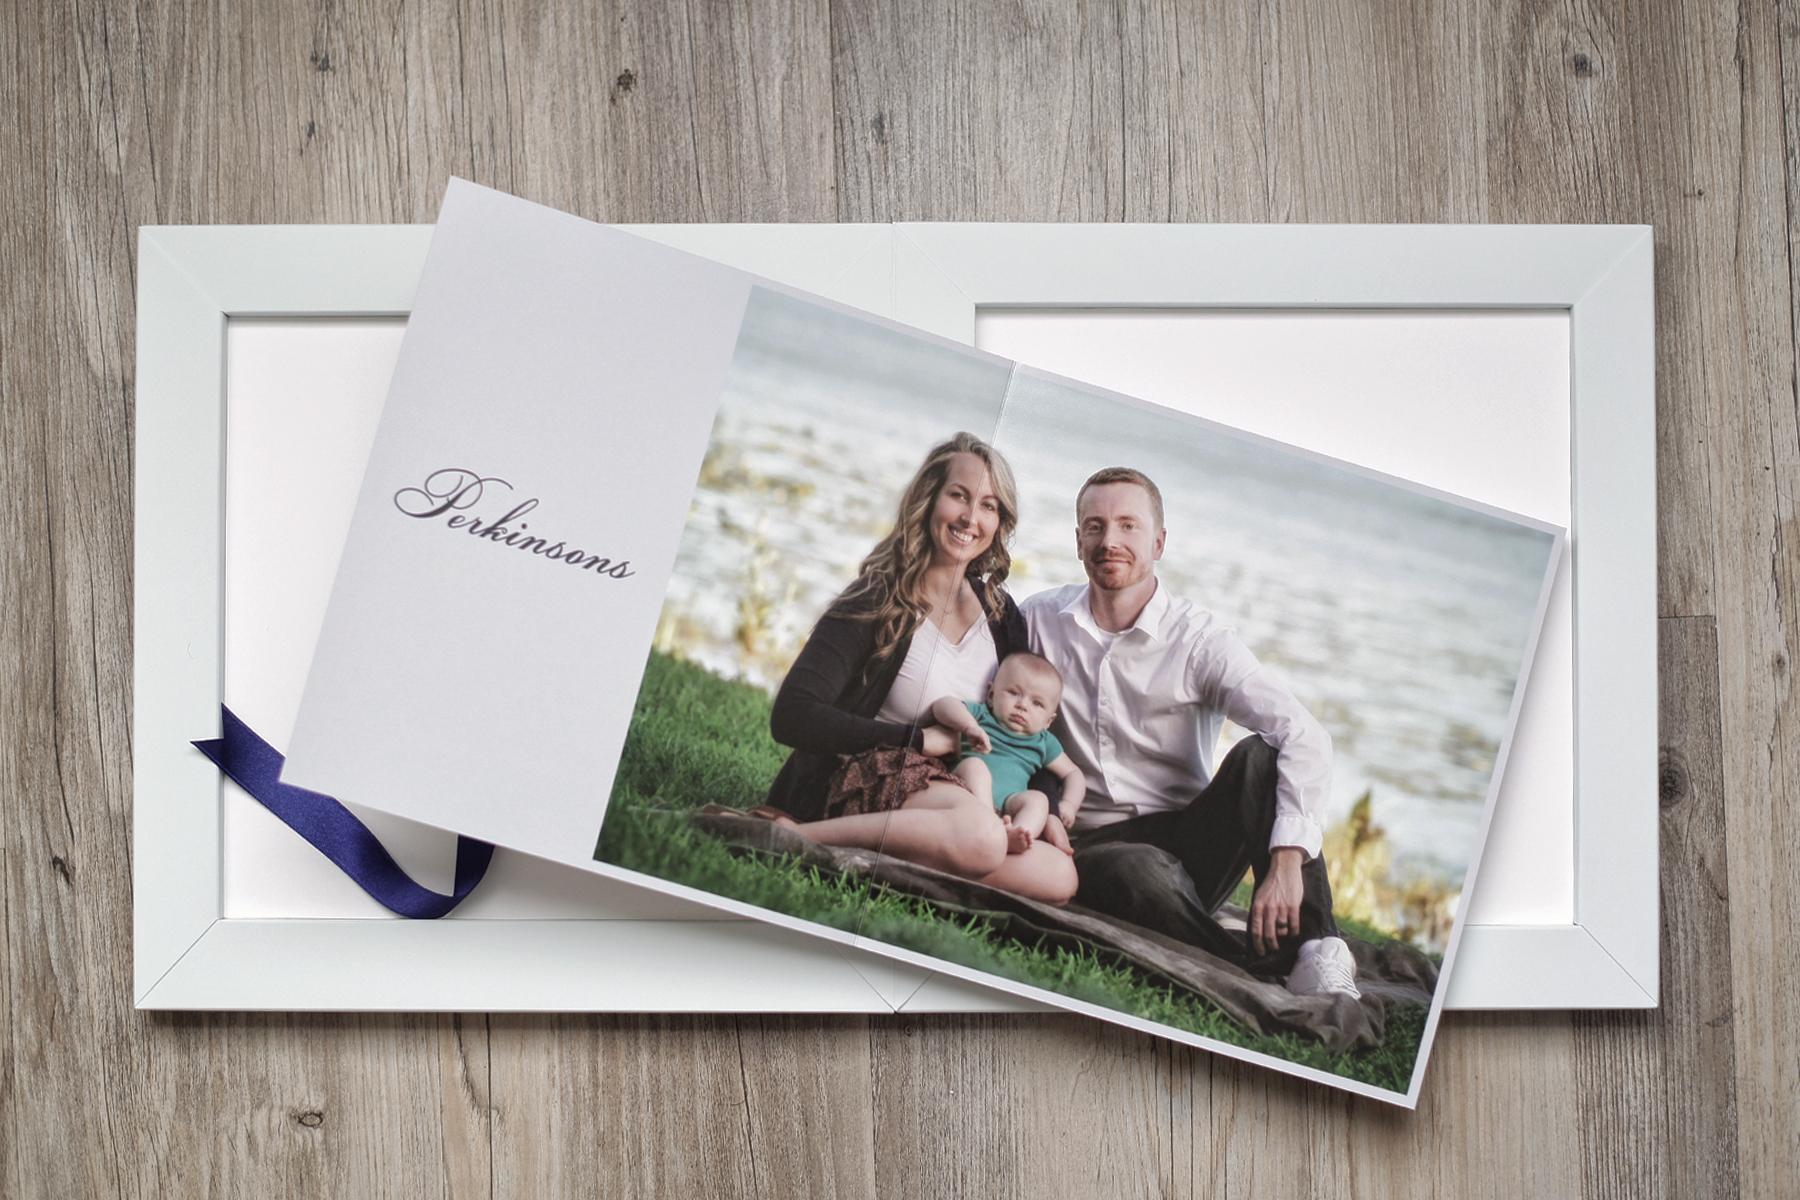 29-orlando-photographer-beautiful-family-album.jpg